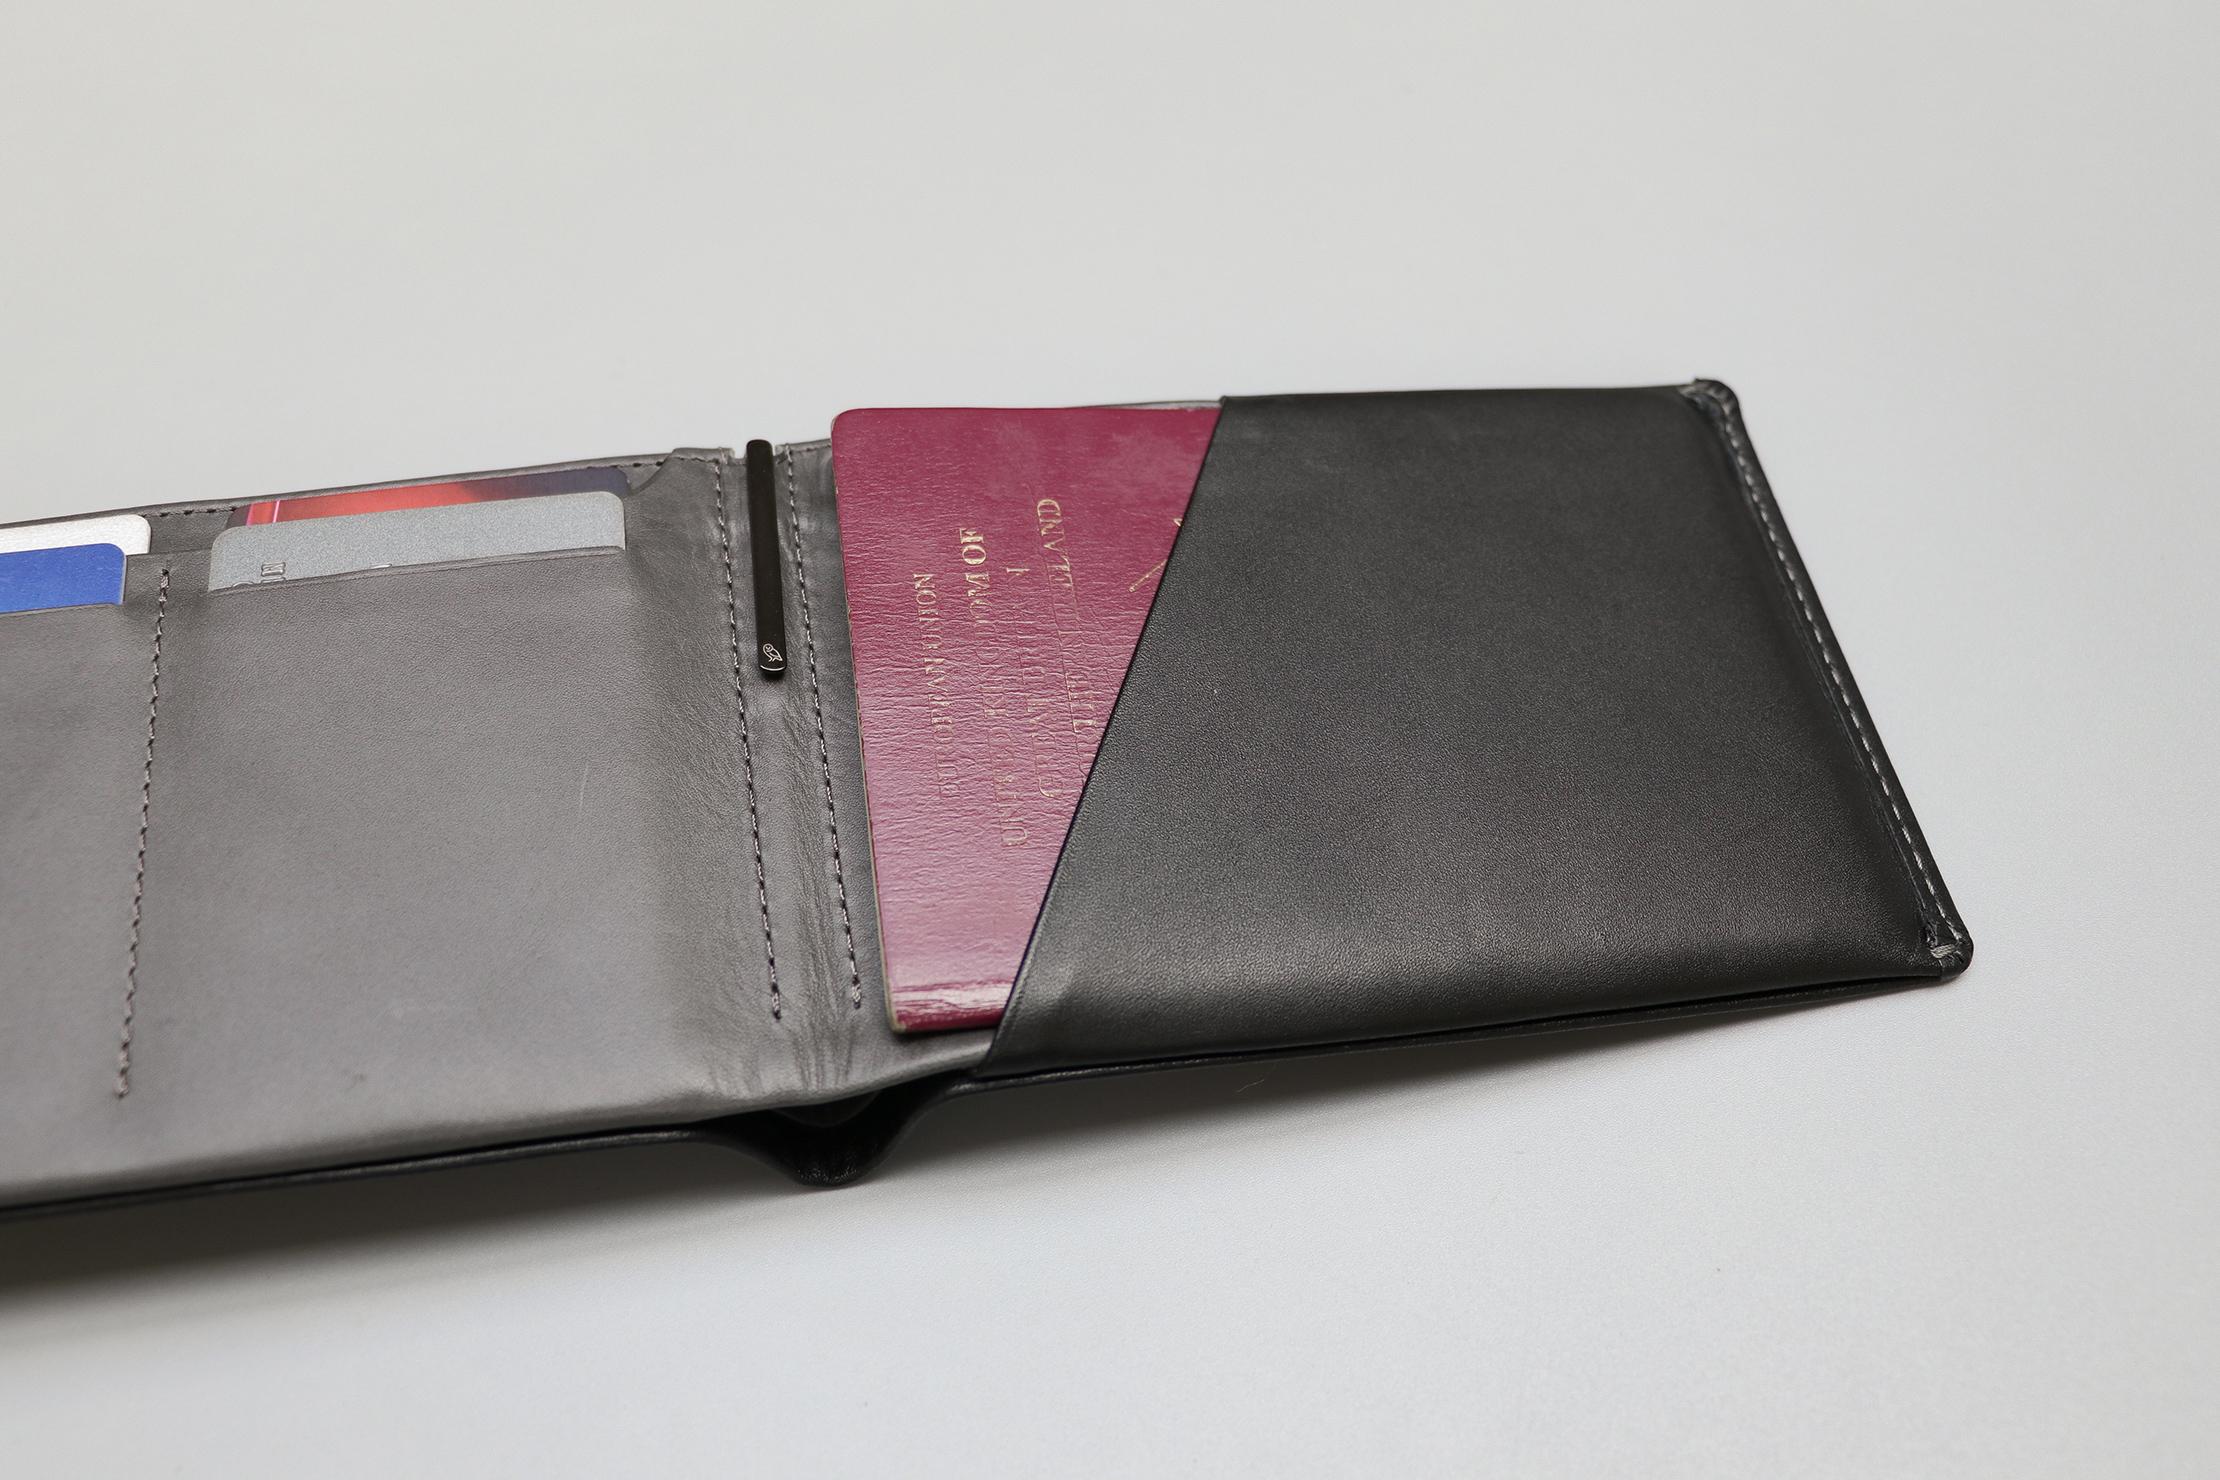 Bellroy Travel Wallet Passport Holder